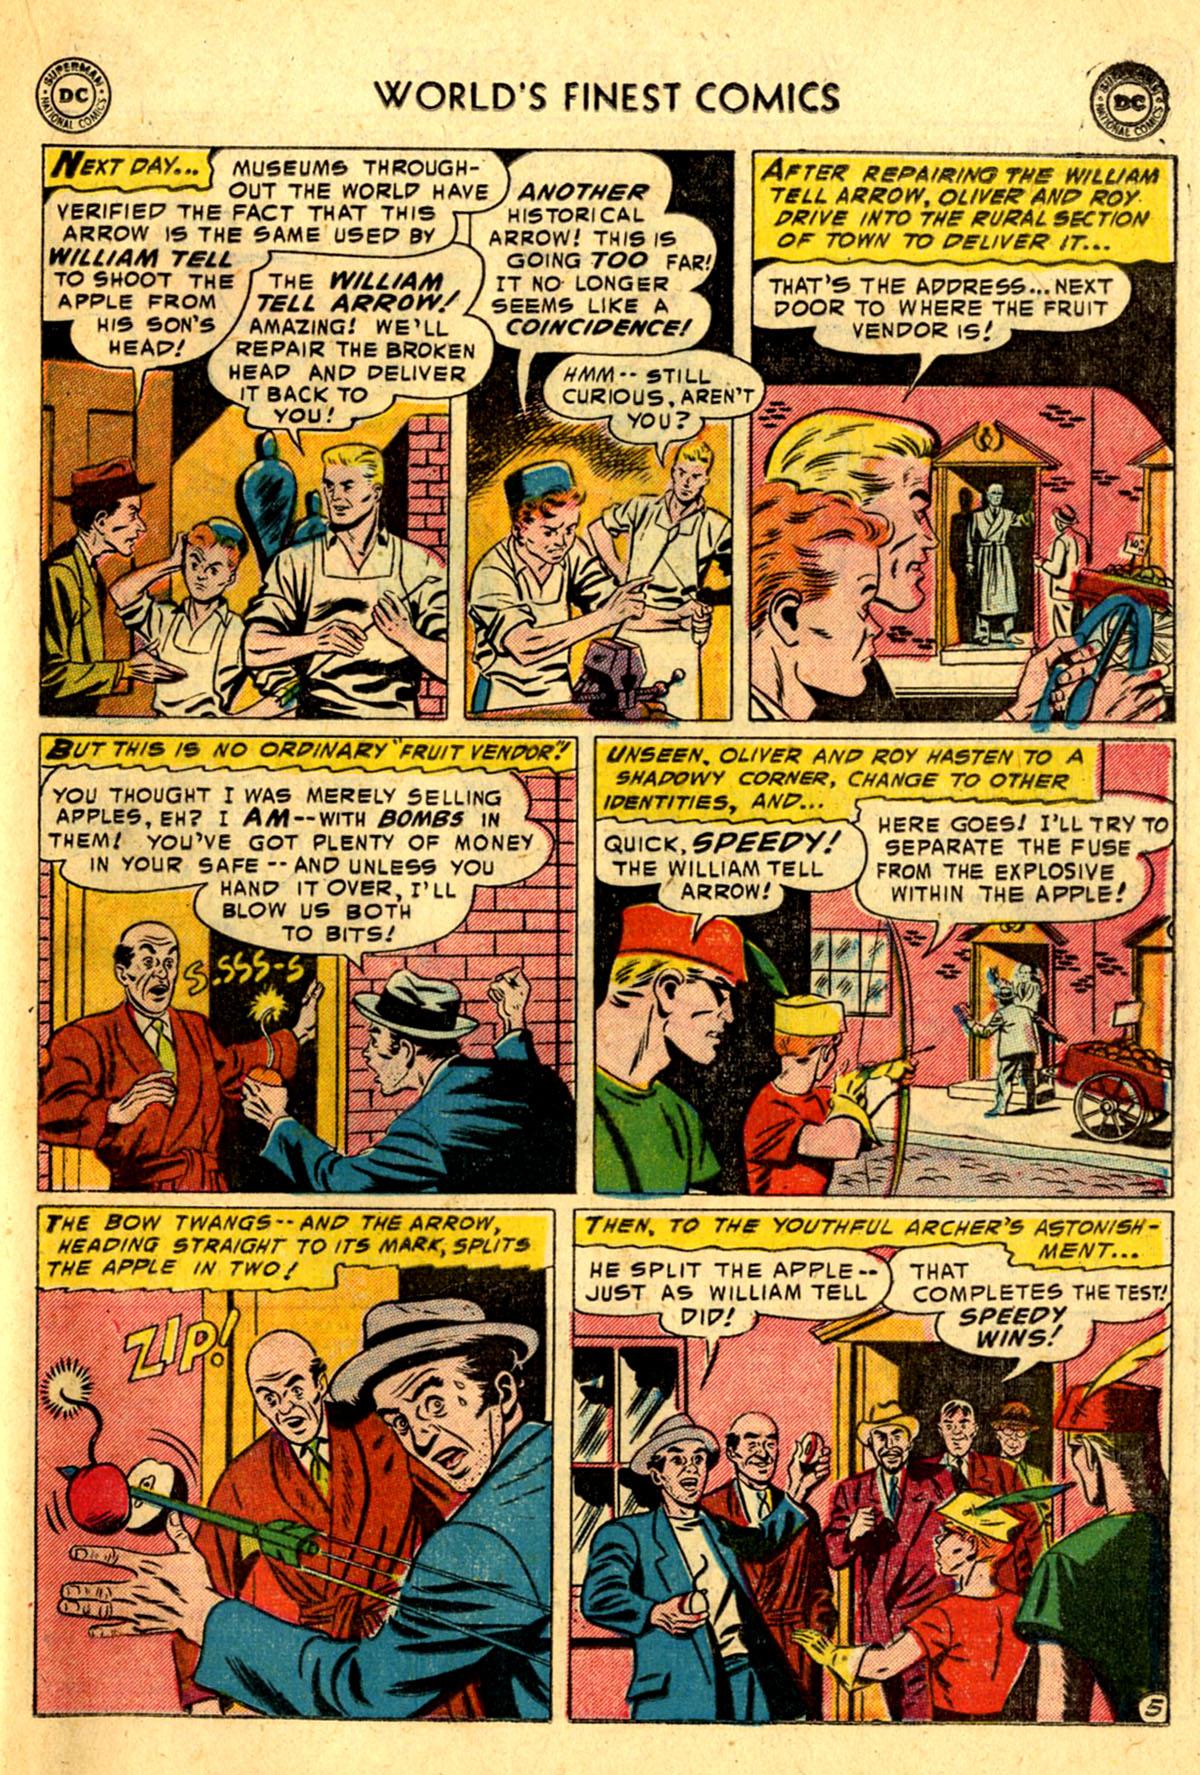 Read online World's Finest Comics comic -  Issue #75 - 21